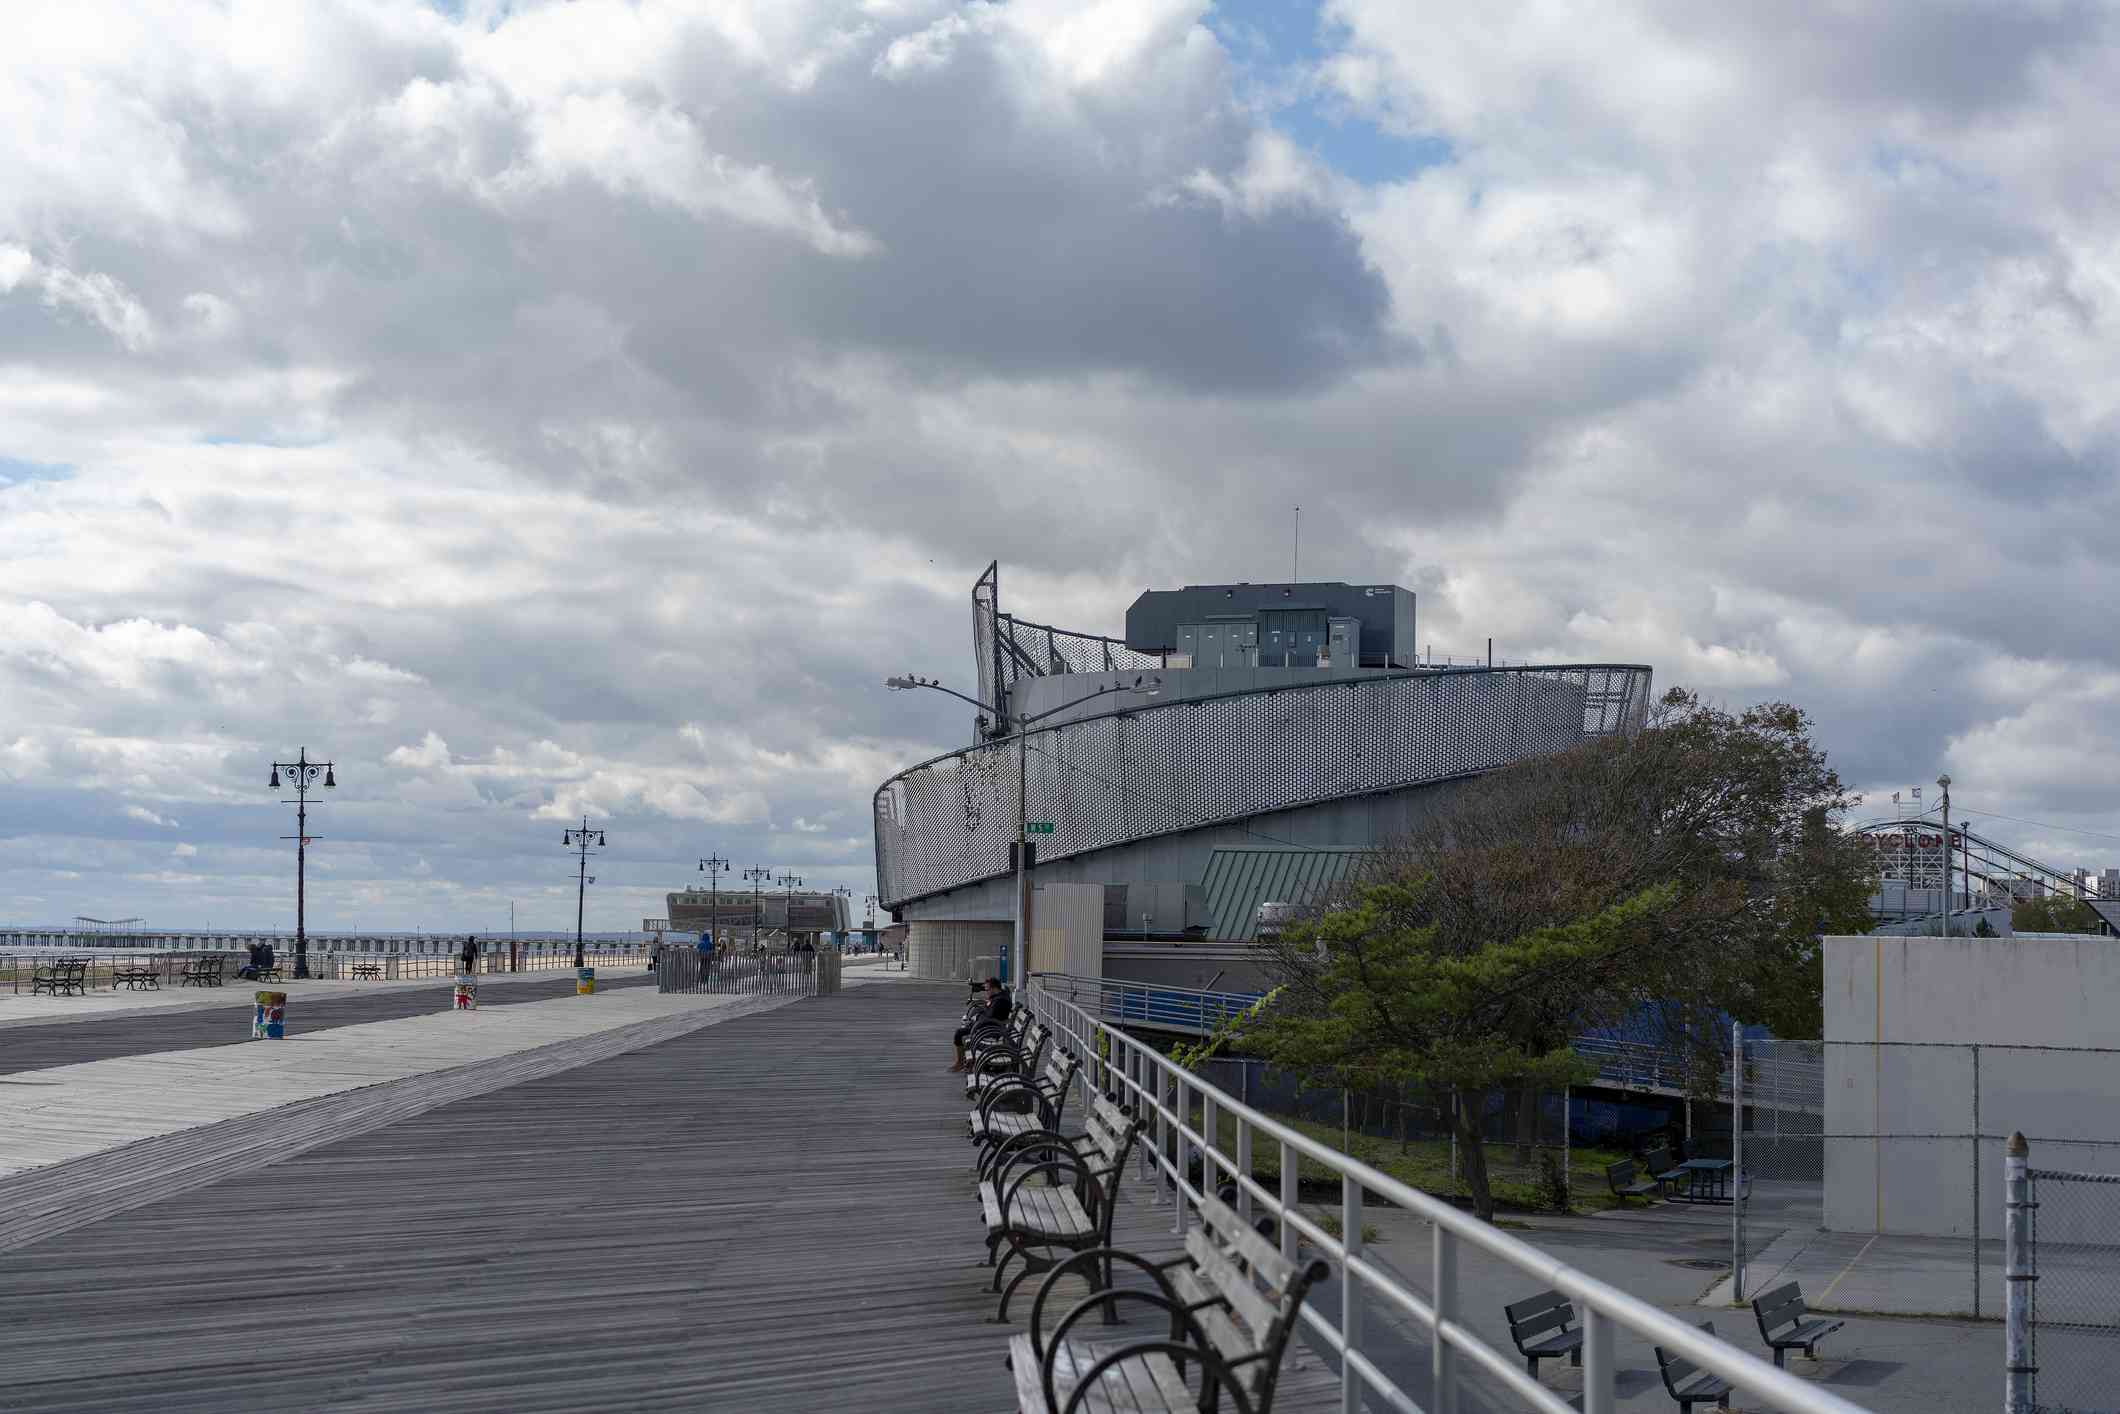 New York Aquarium along the Coney Island Boardwalk